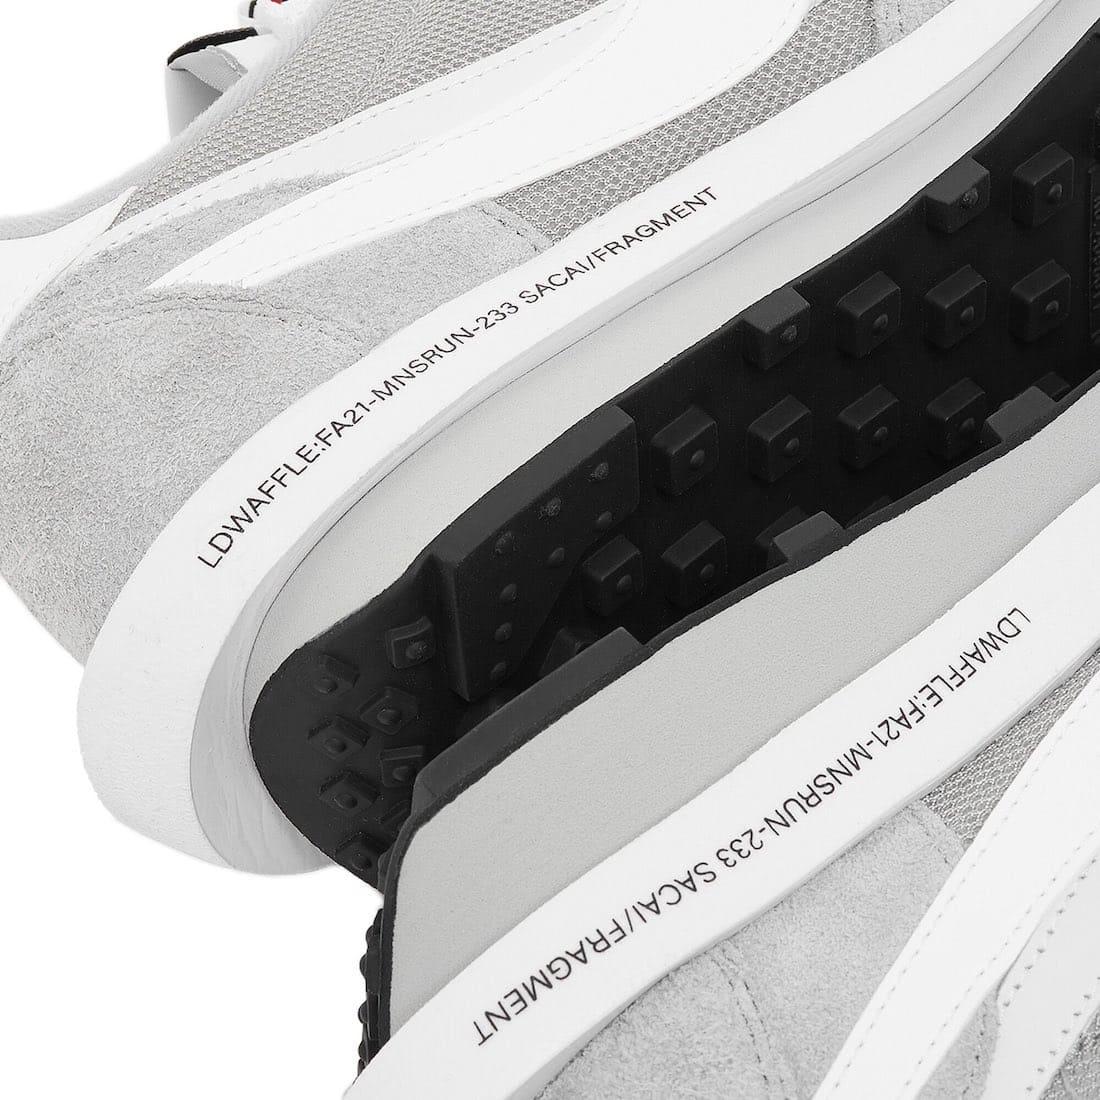 Sacai x fragment design x Nike LDWaffle Wolf Grey Midsole